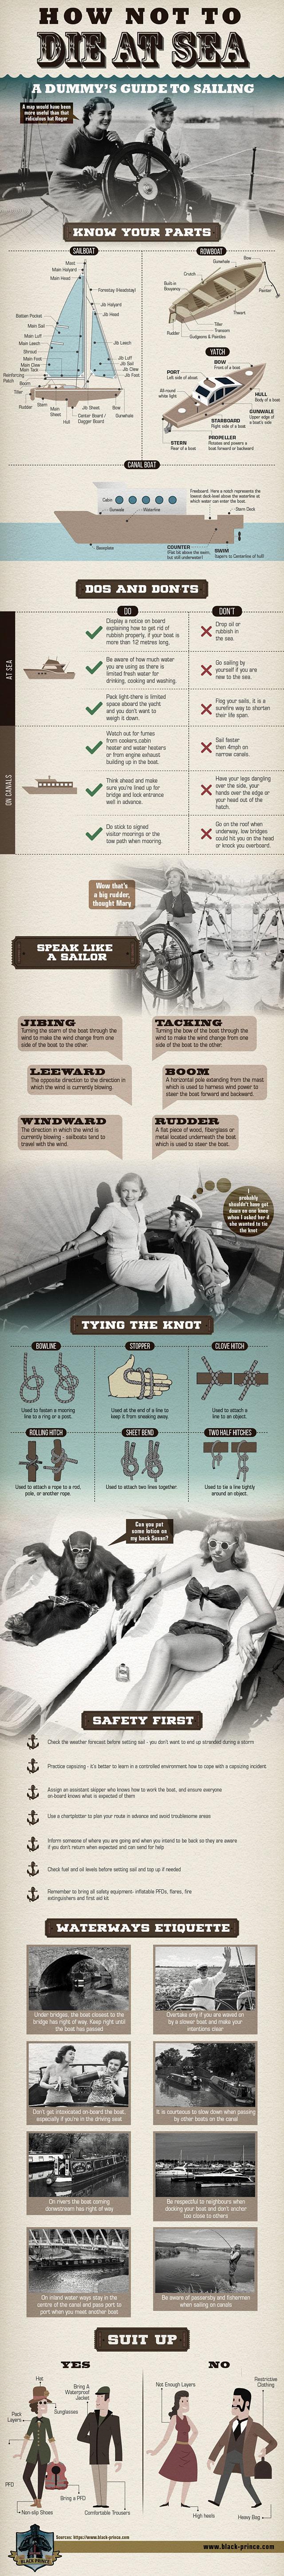 How not to die at sea